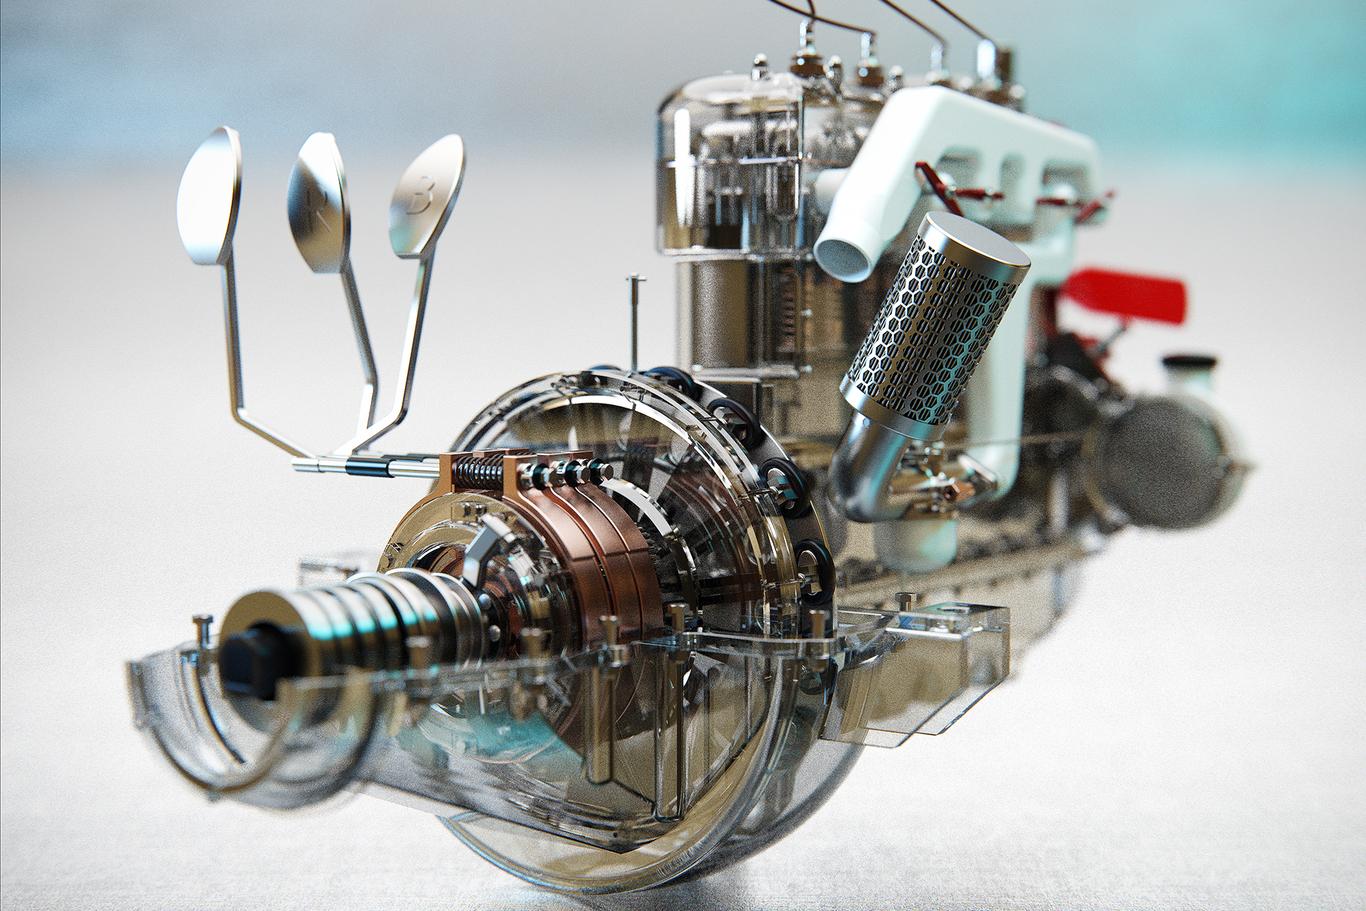 Michaelmarcondes paddy engine 1 e4e66492 25ft